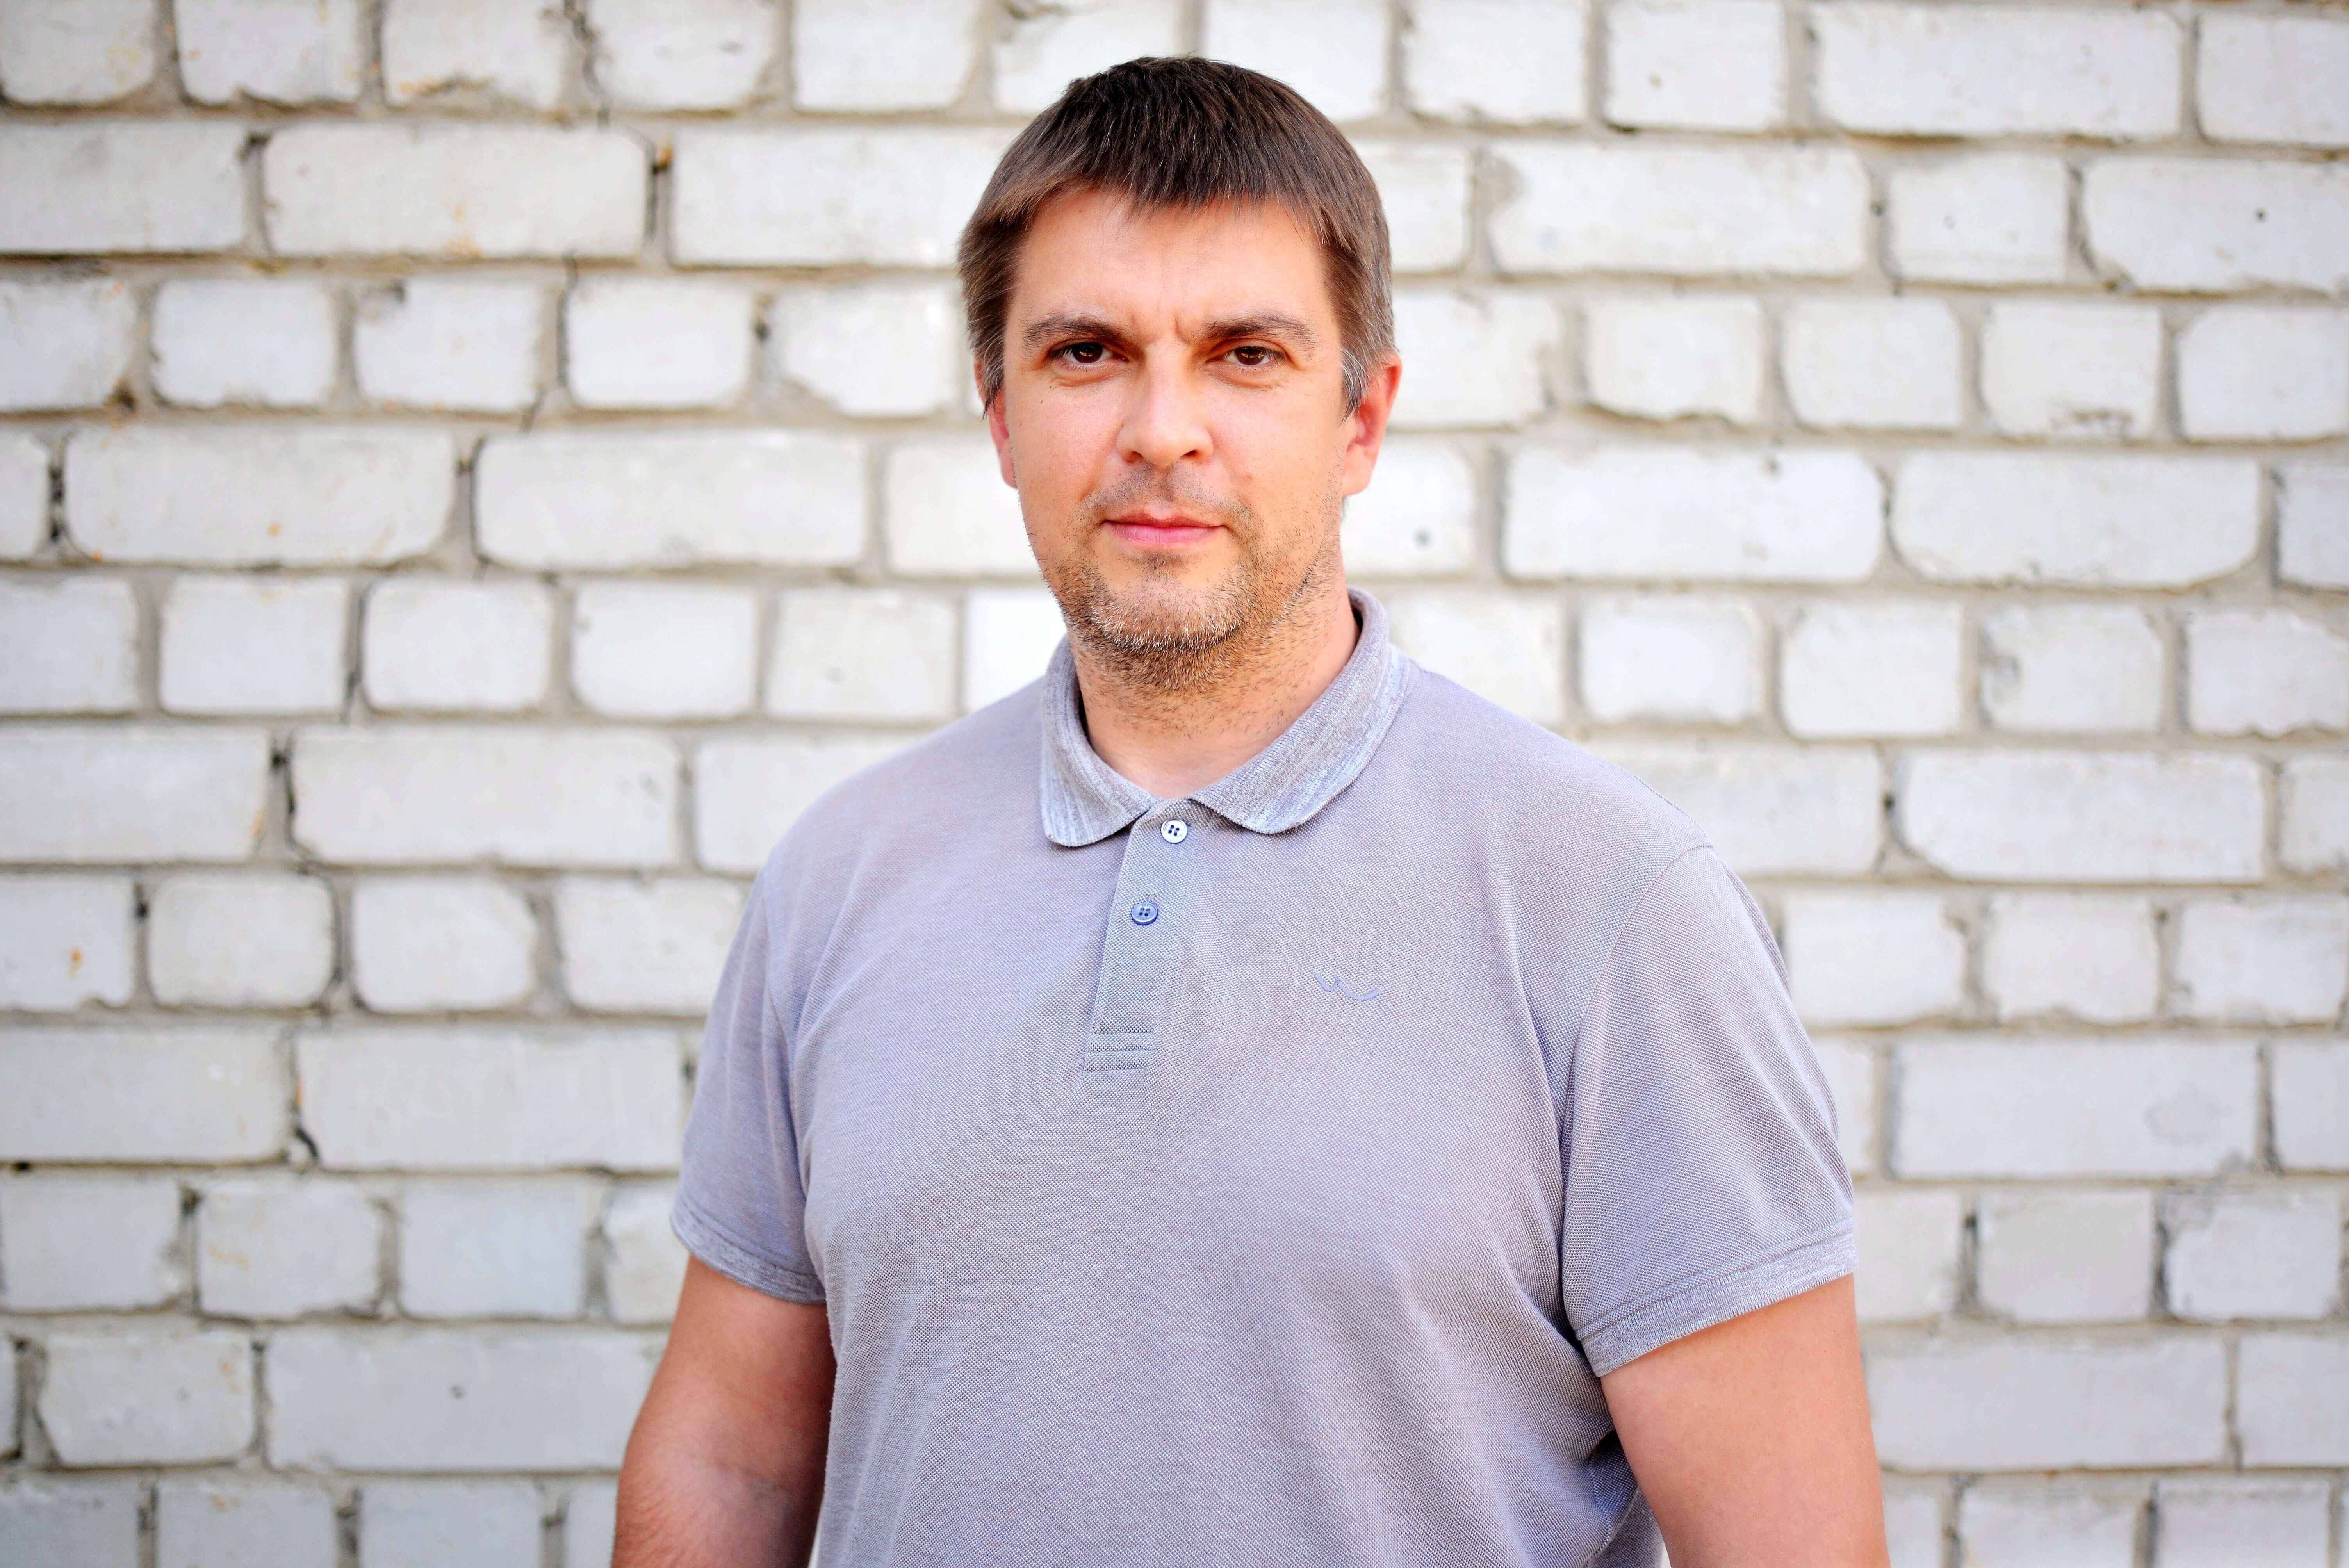 Image of Євген Блохін, Логістика і маркетинг at ProOrganica